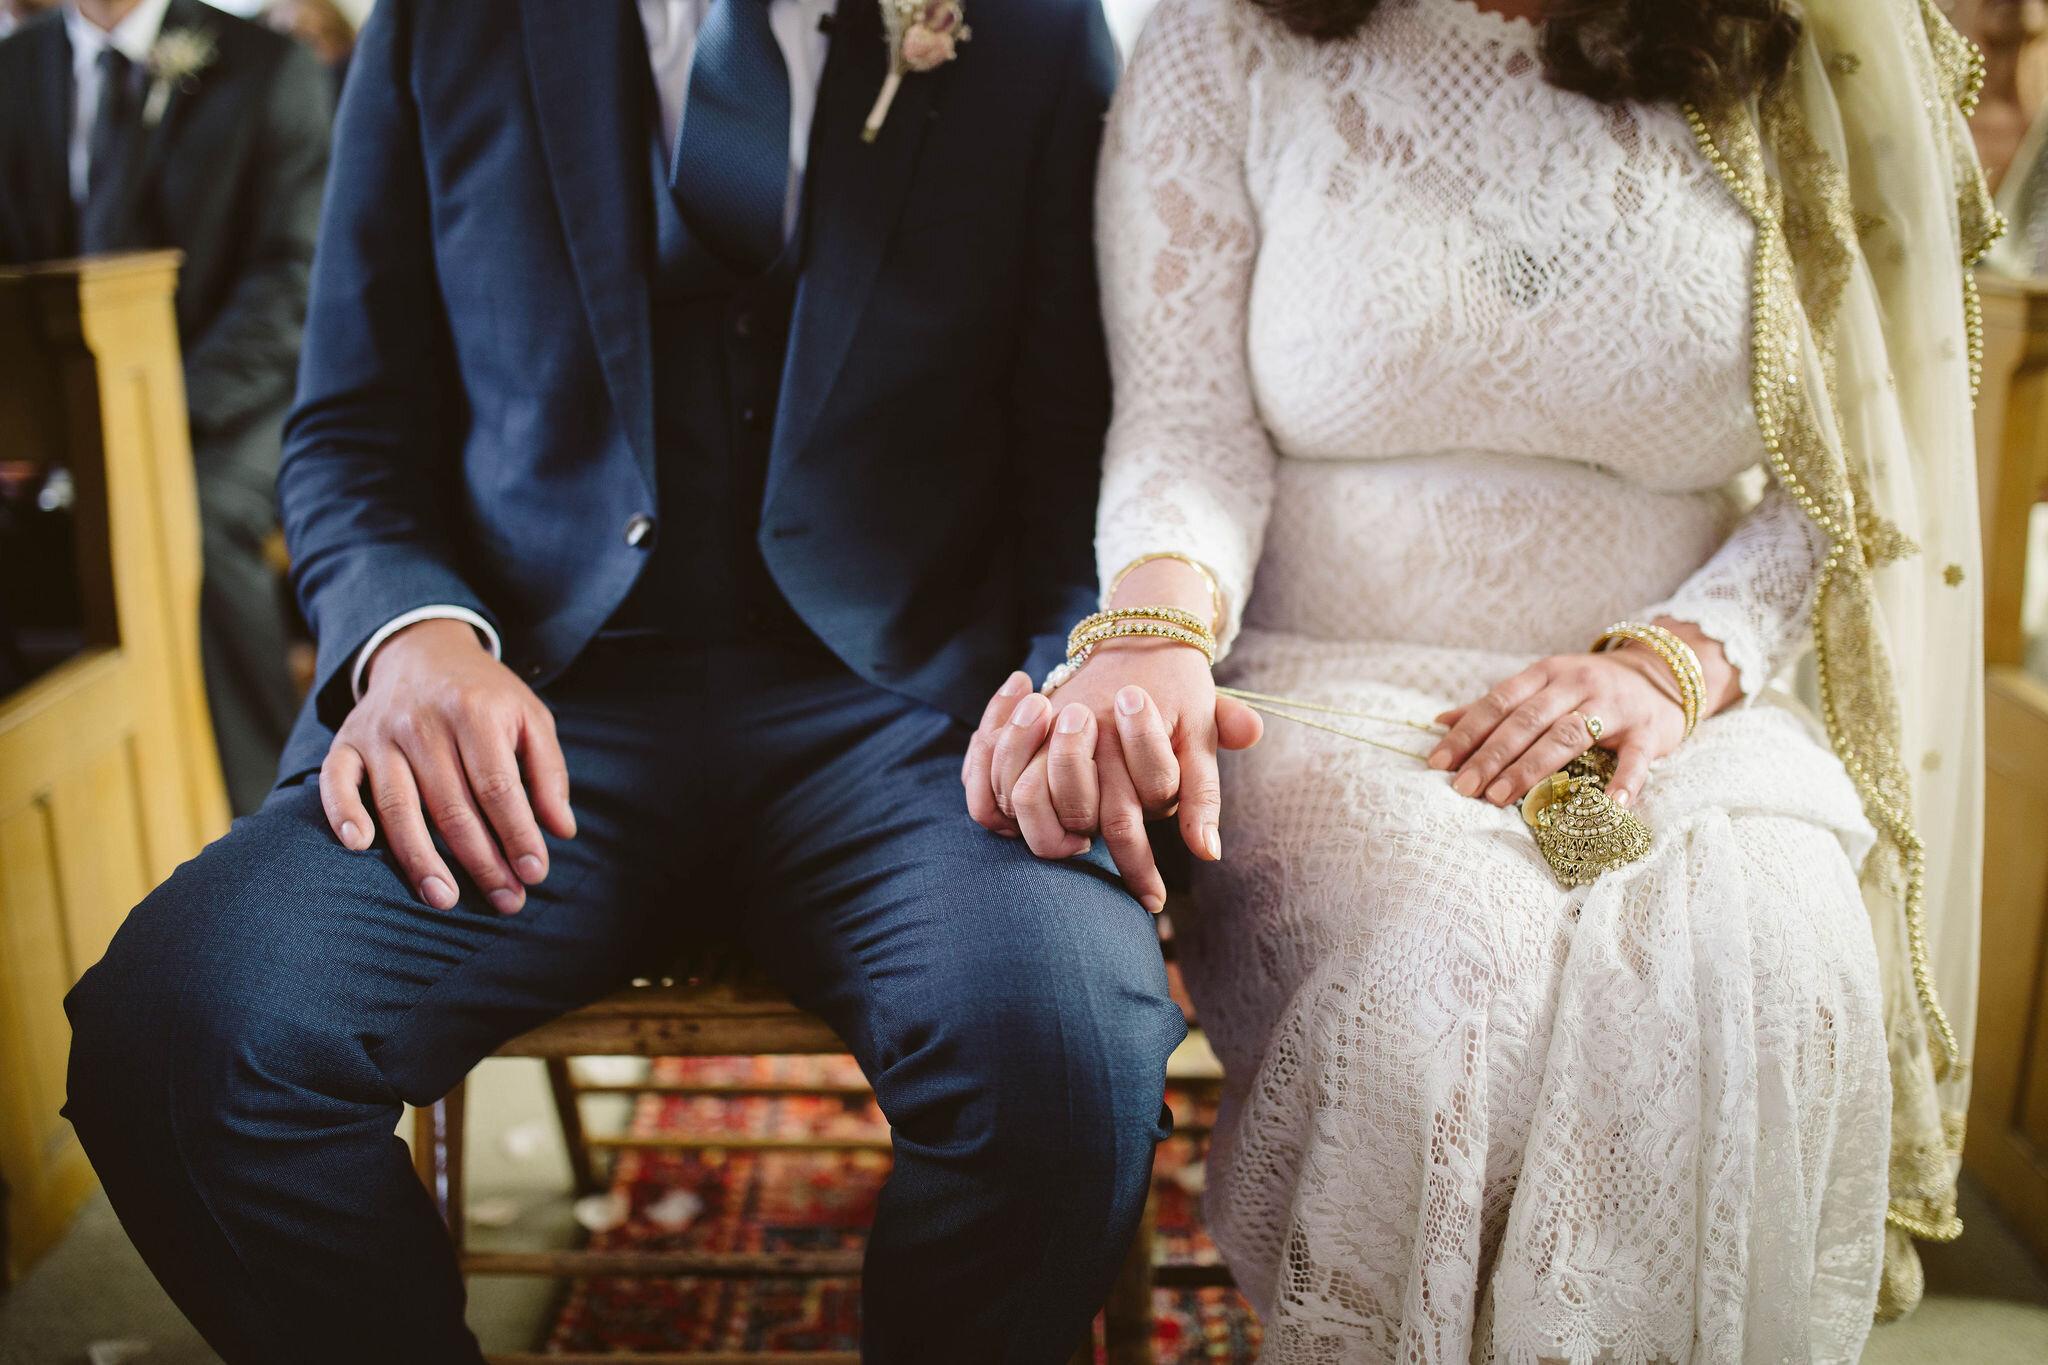 Venture-Retreat-Center-Wedding-Pescadero-Sat-Aaron-Pritam-The-Shalom-Imaginative-229.jpg